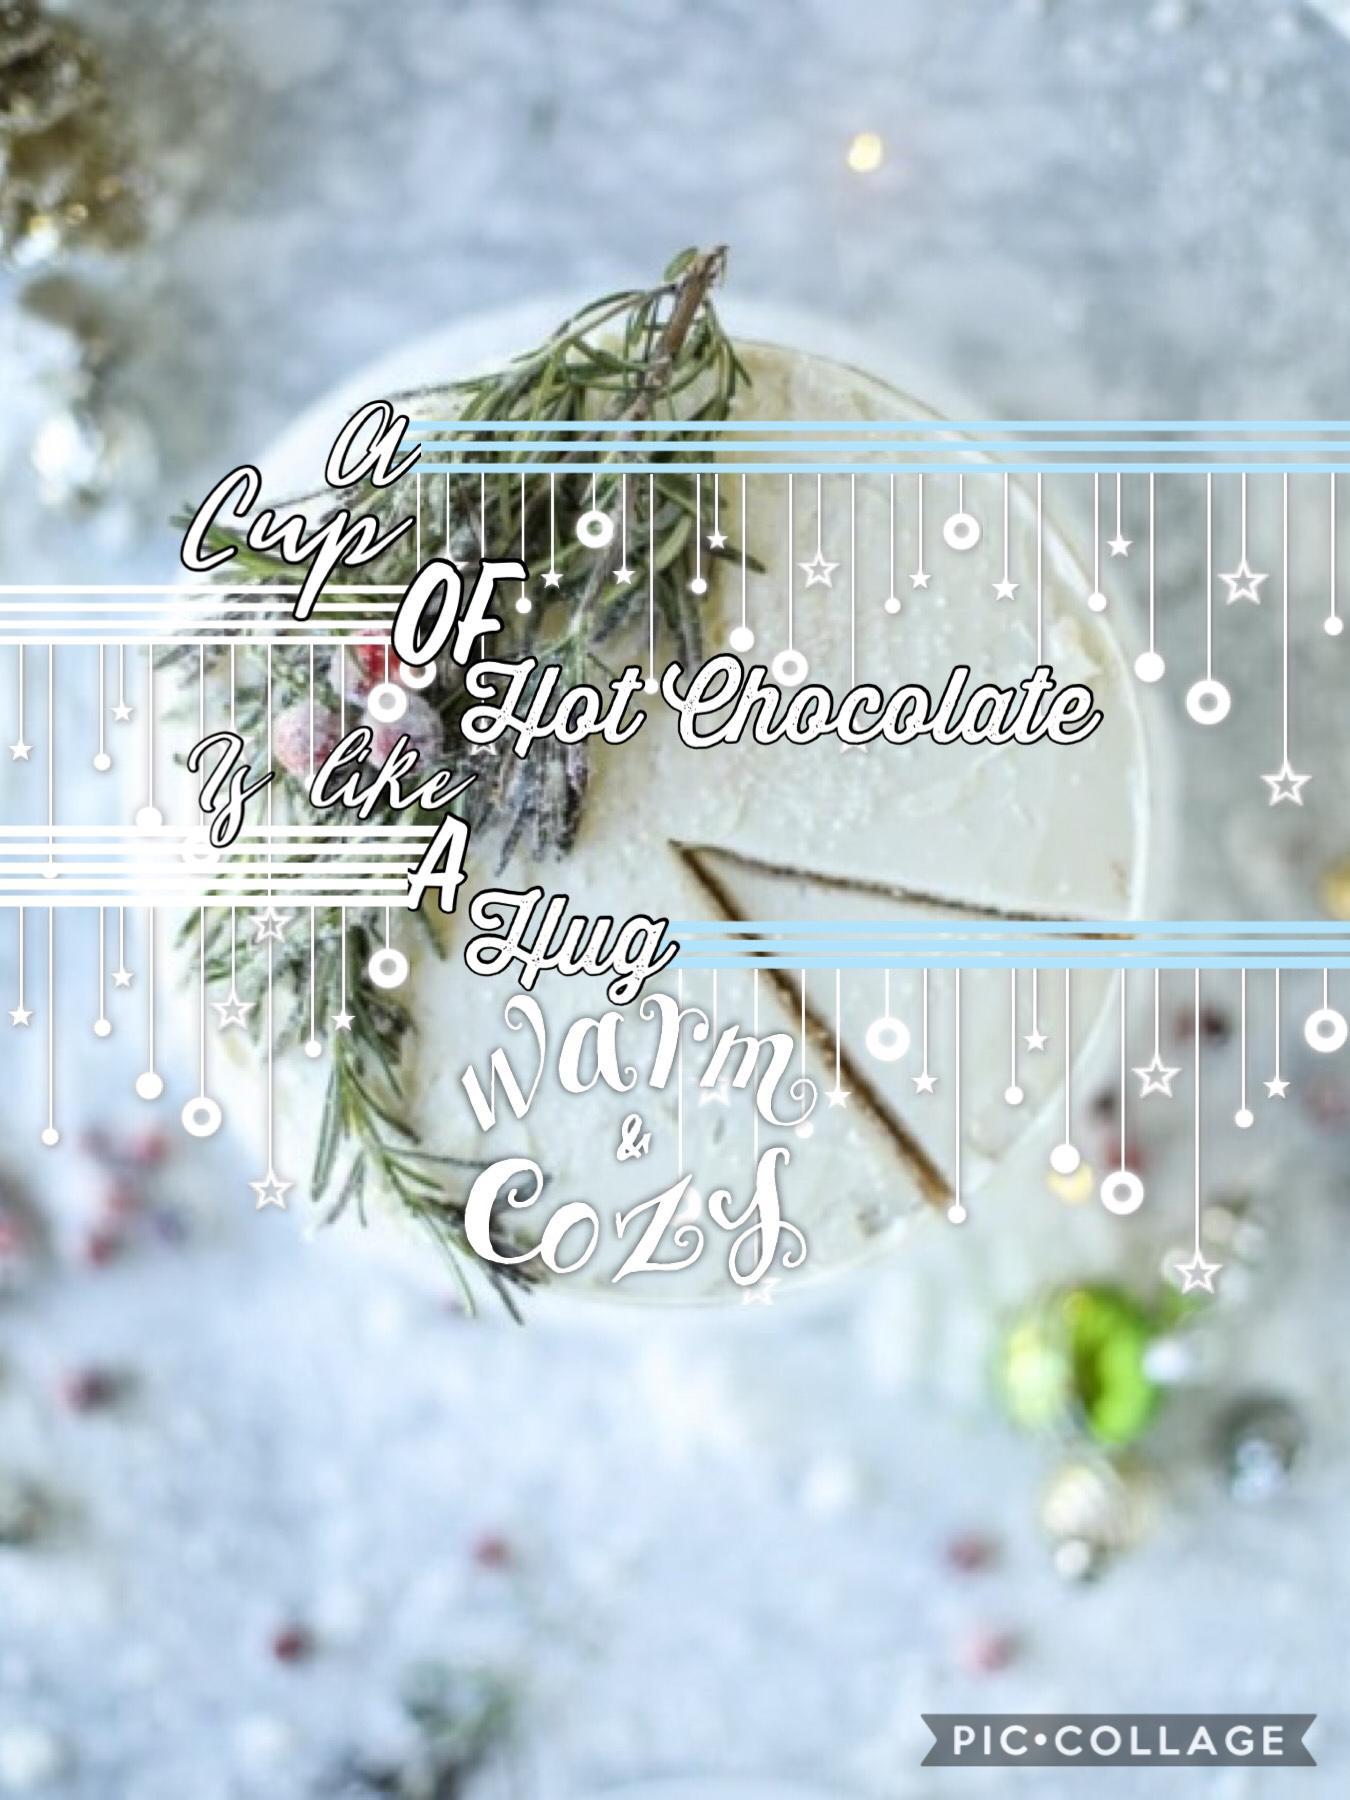 Merry Christmas🤍🎄